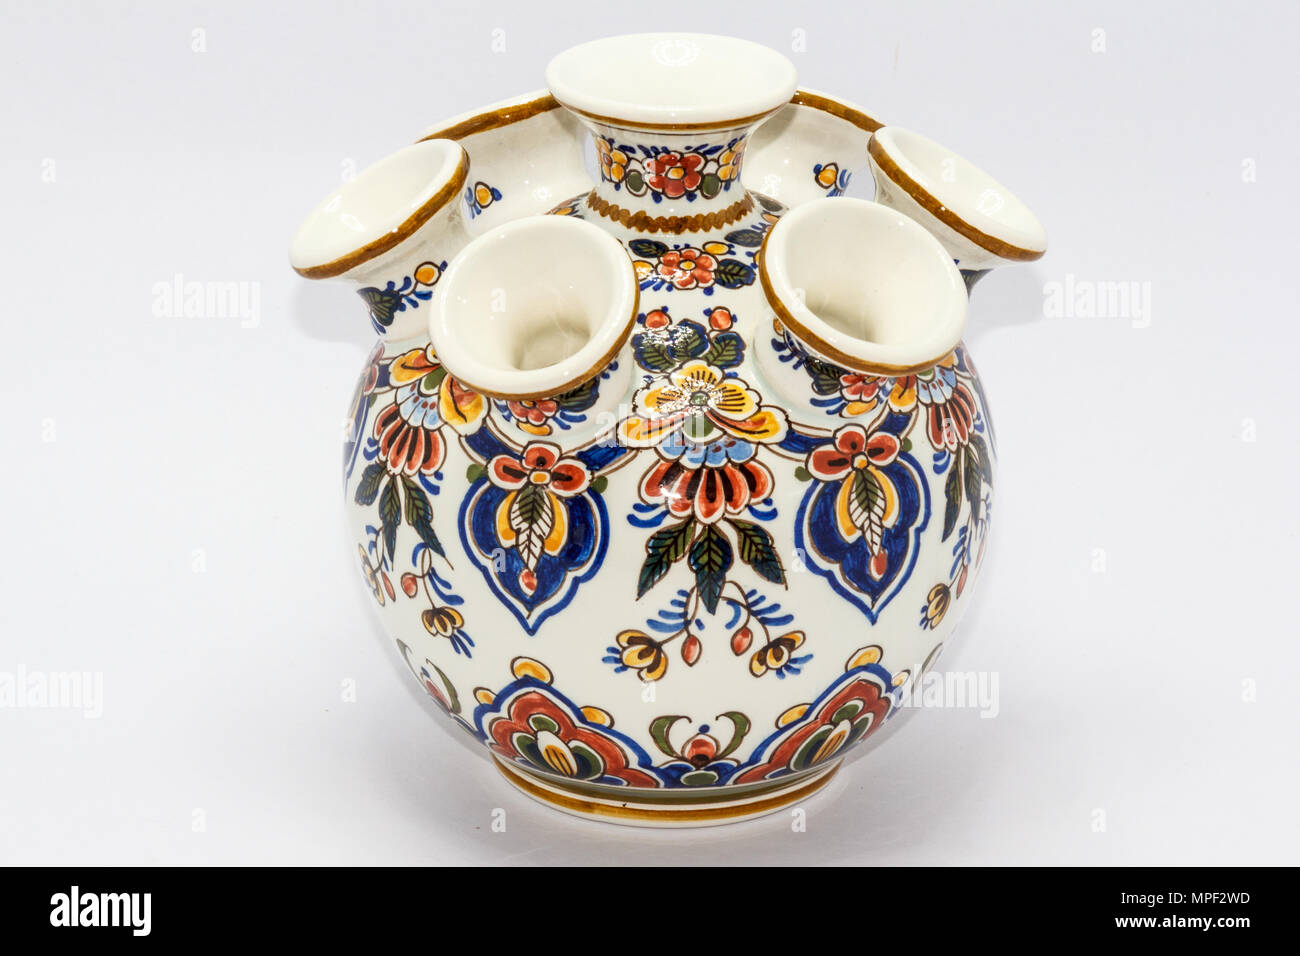 Delft pottery tulip vase - Stock Image